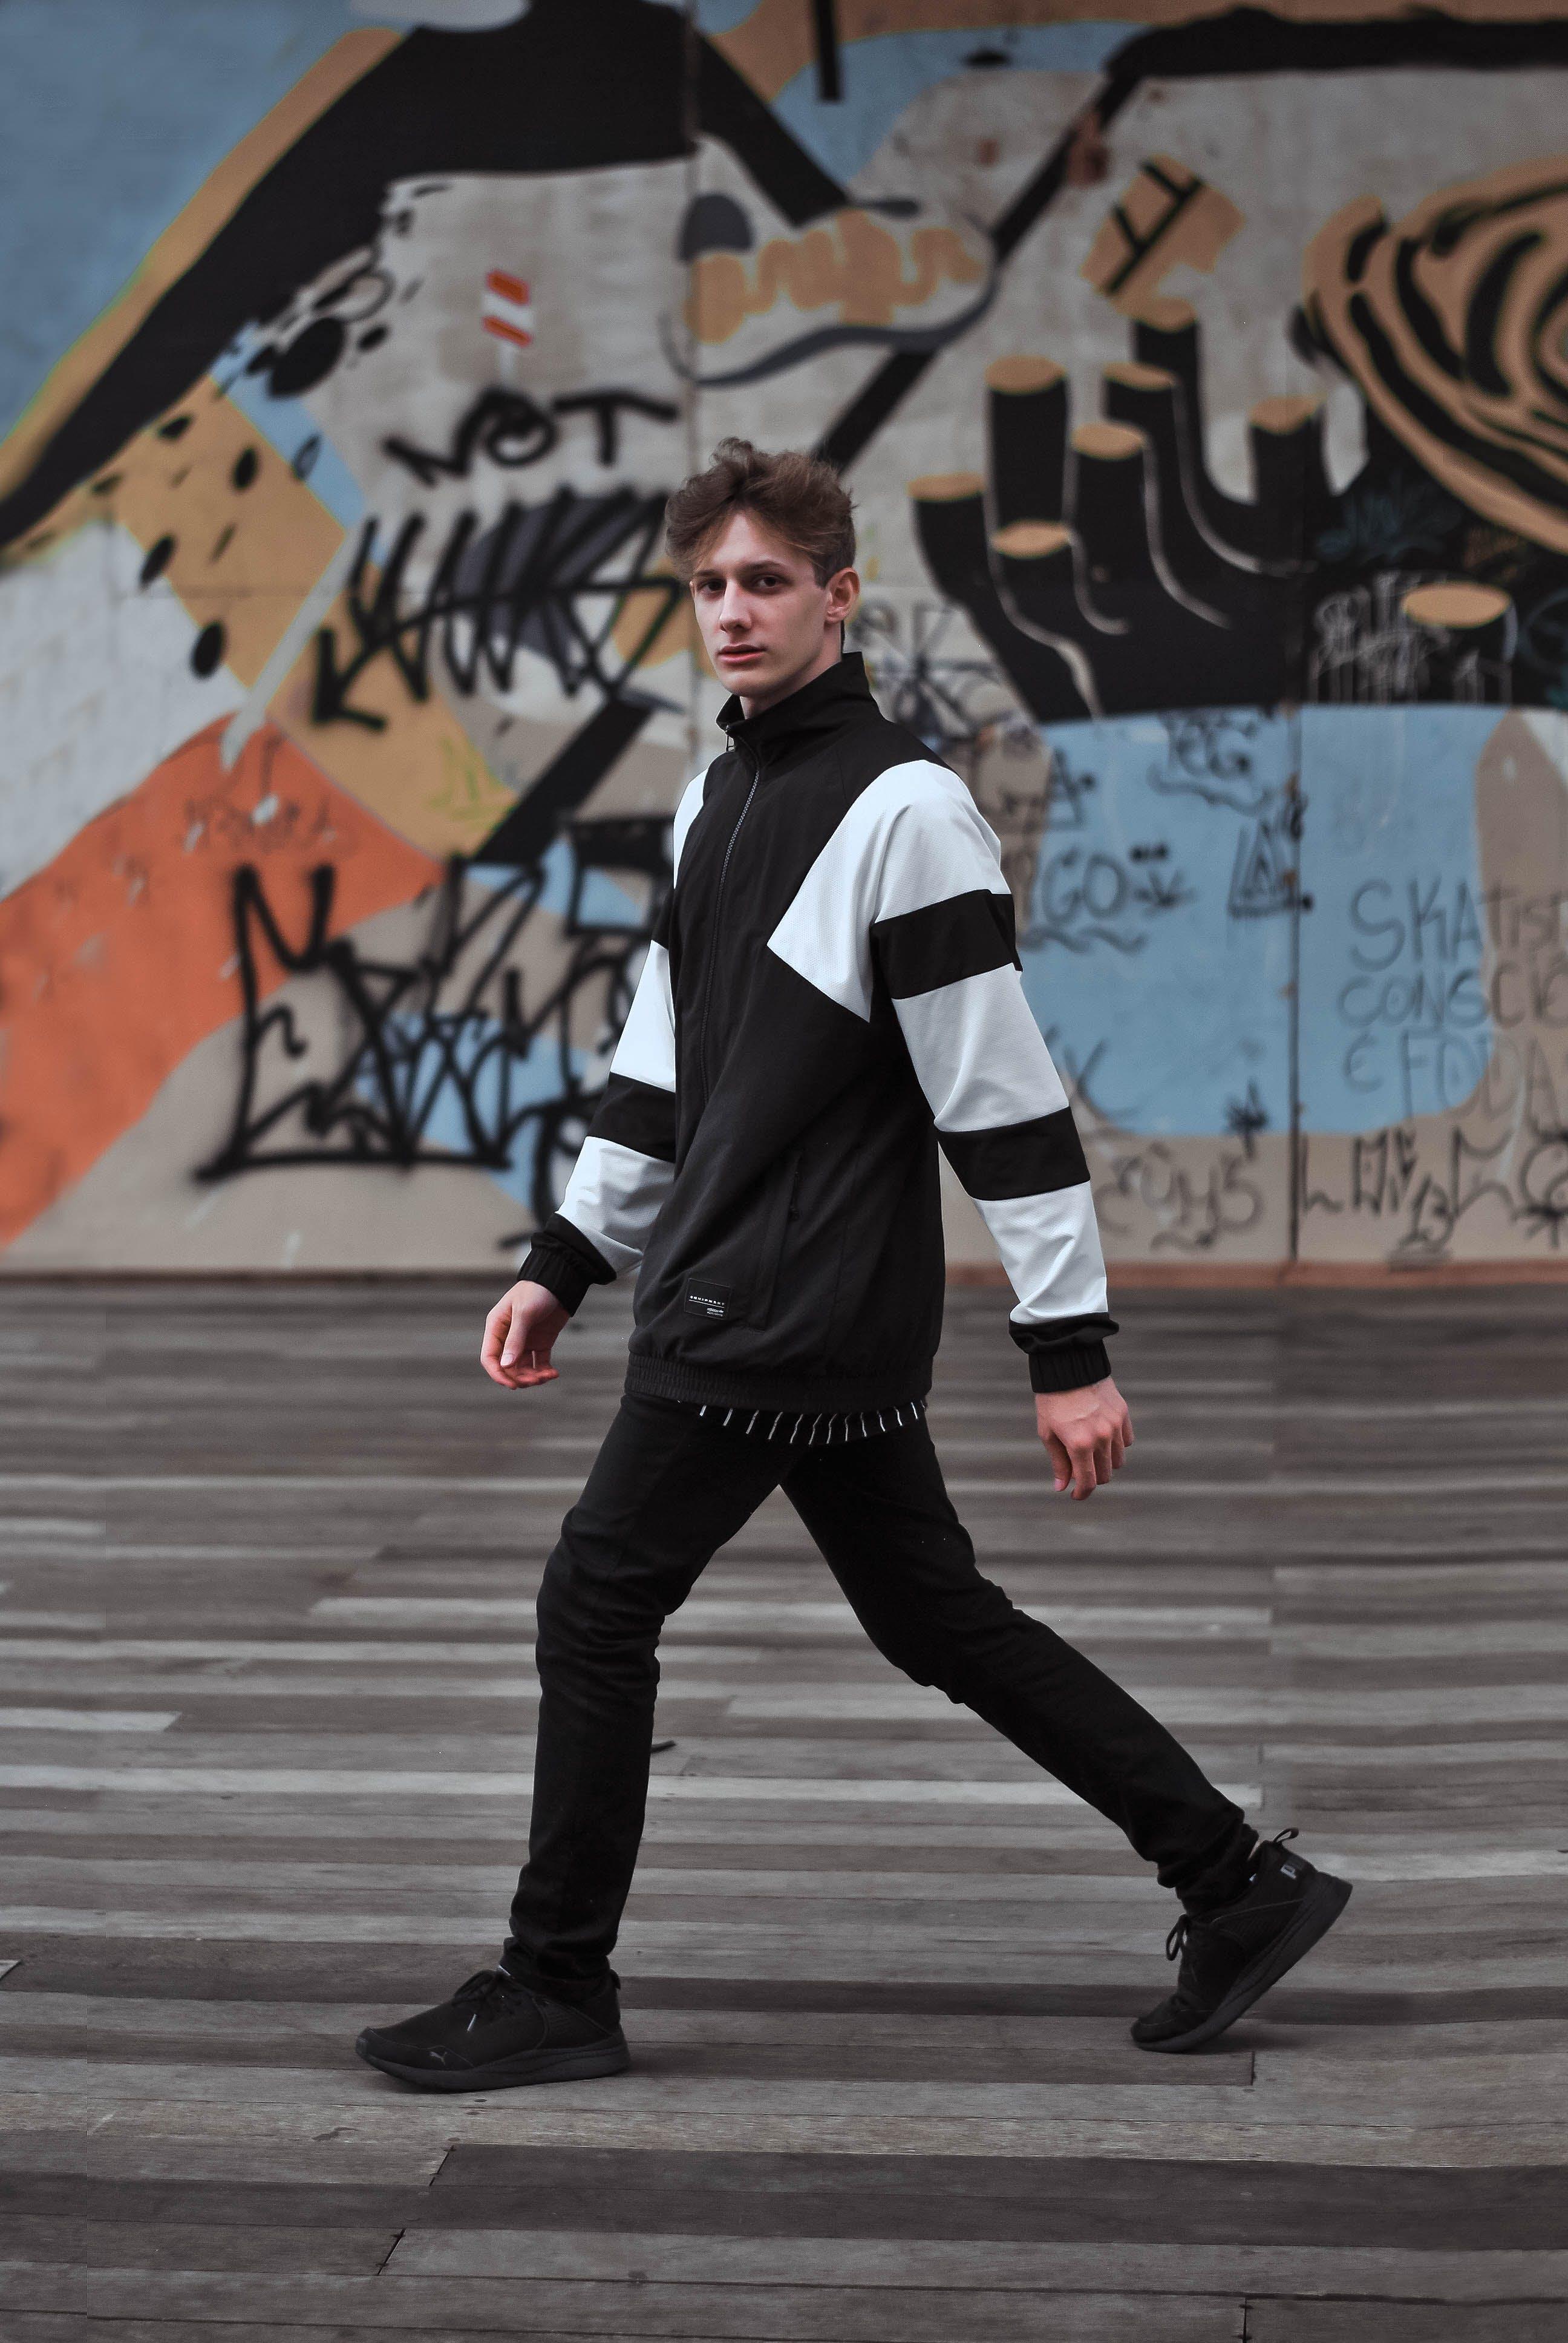 Free stock photo of fashion photography, male model